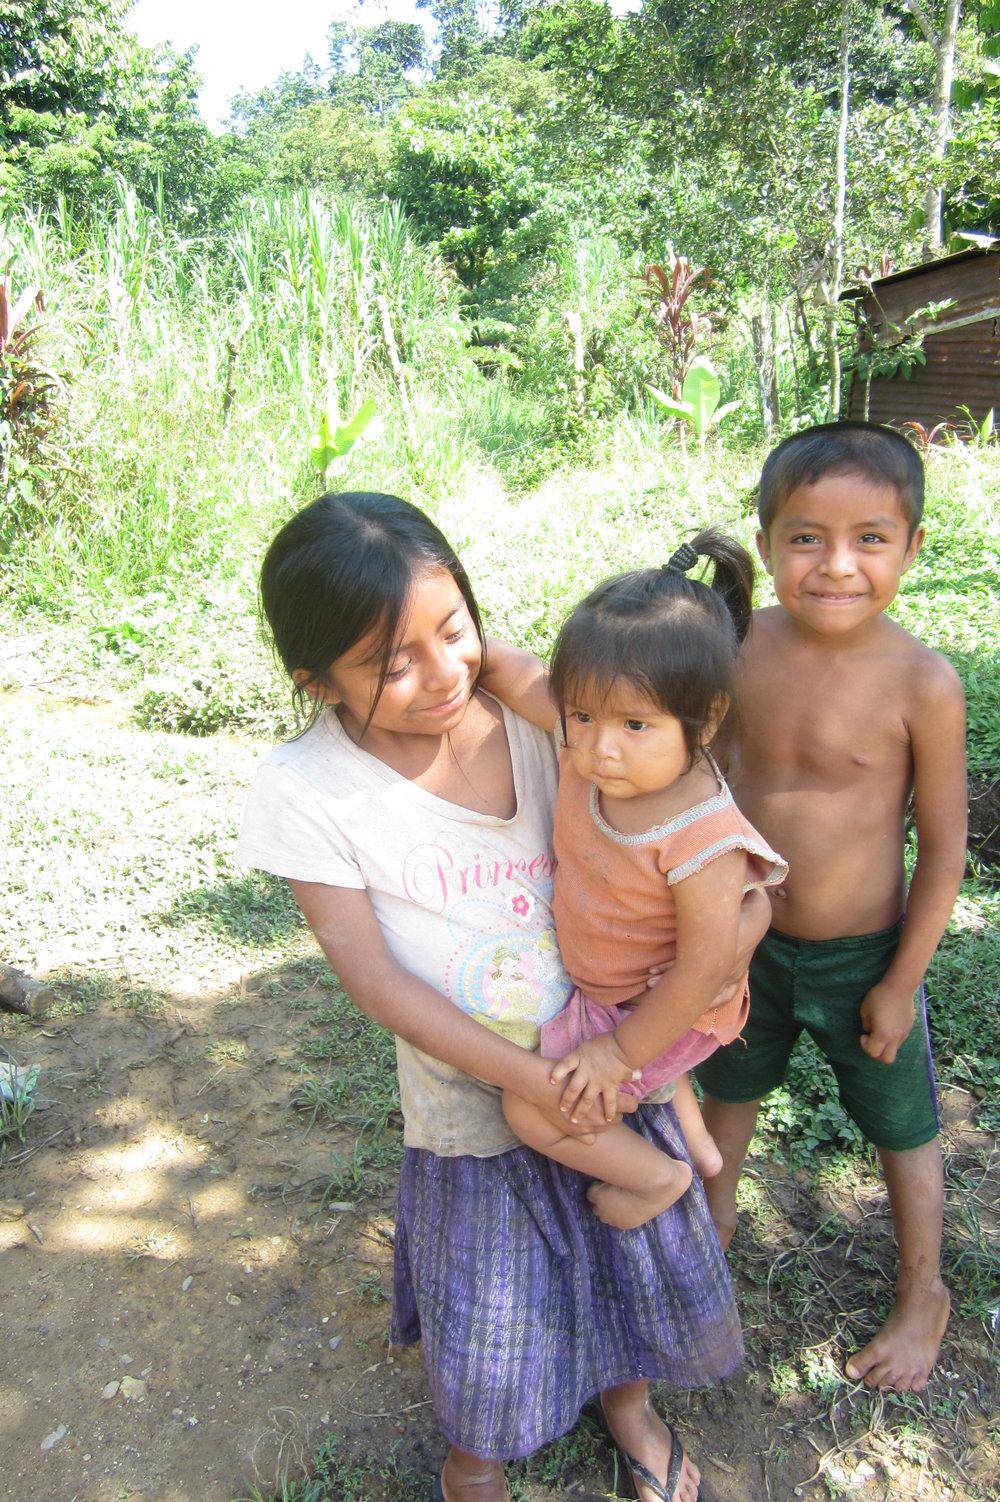 Children of Piedras Blancas